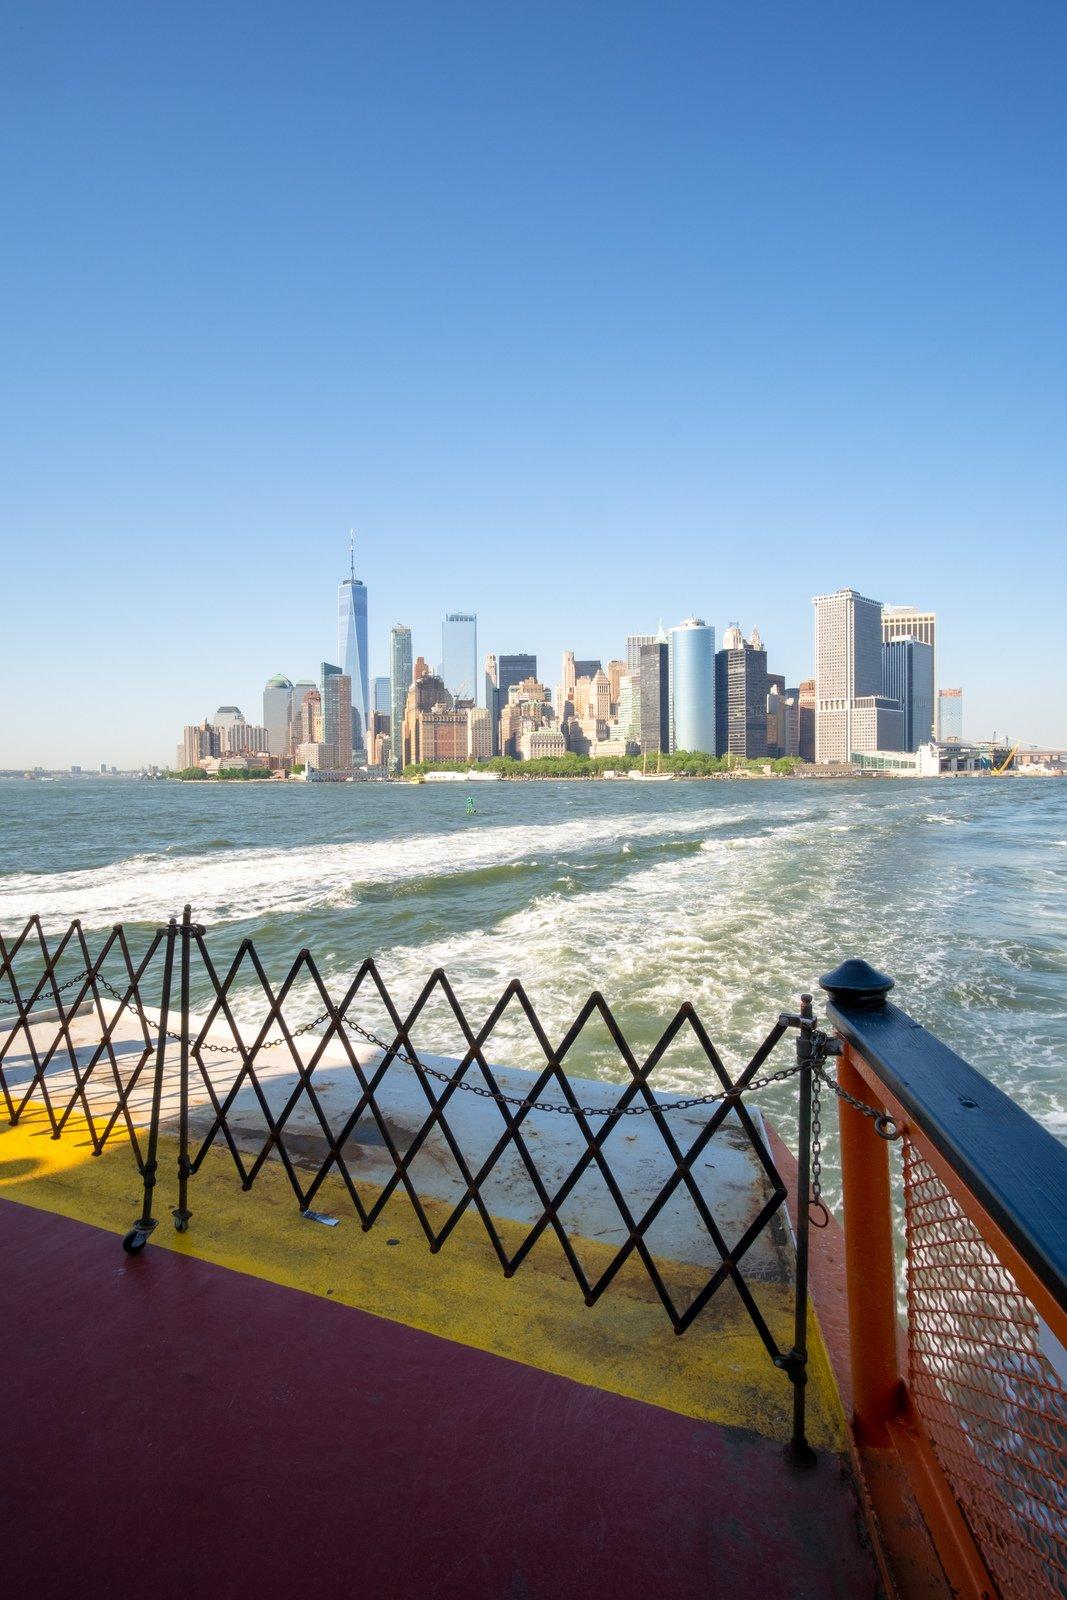 Saint George Staten Island, NY Private Investigator